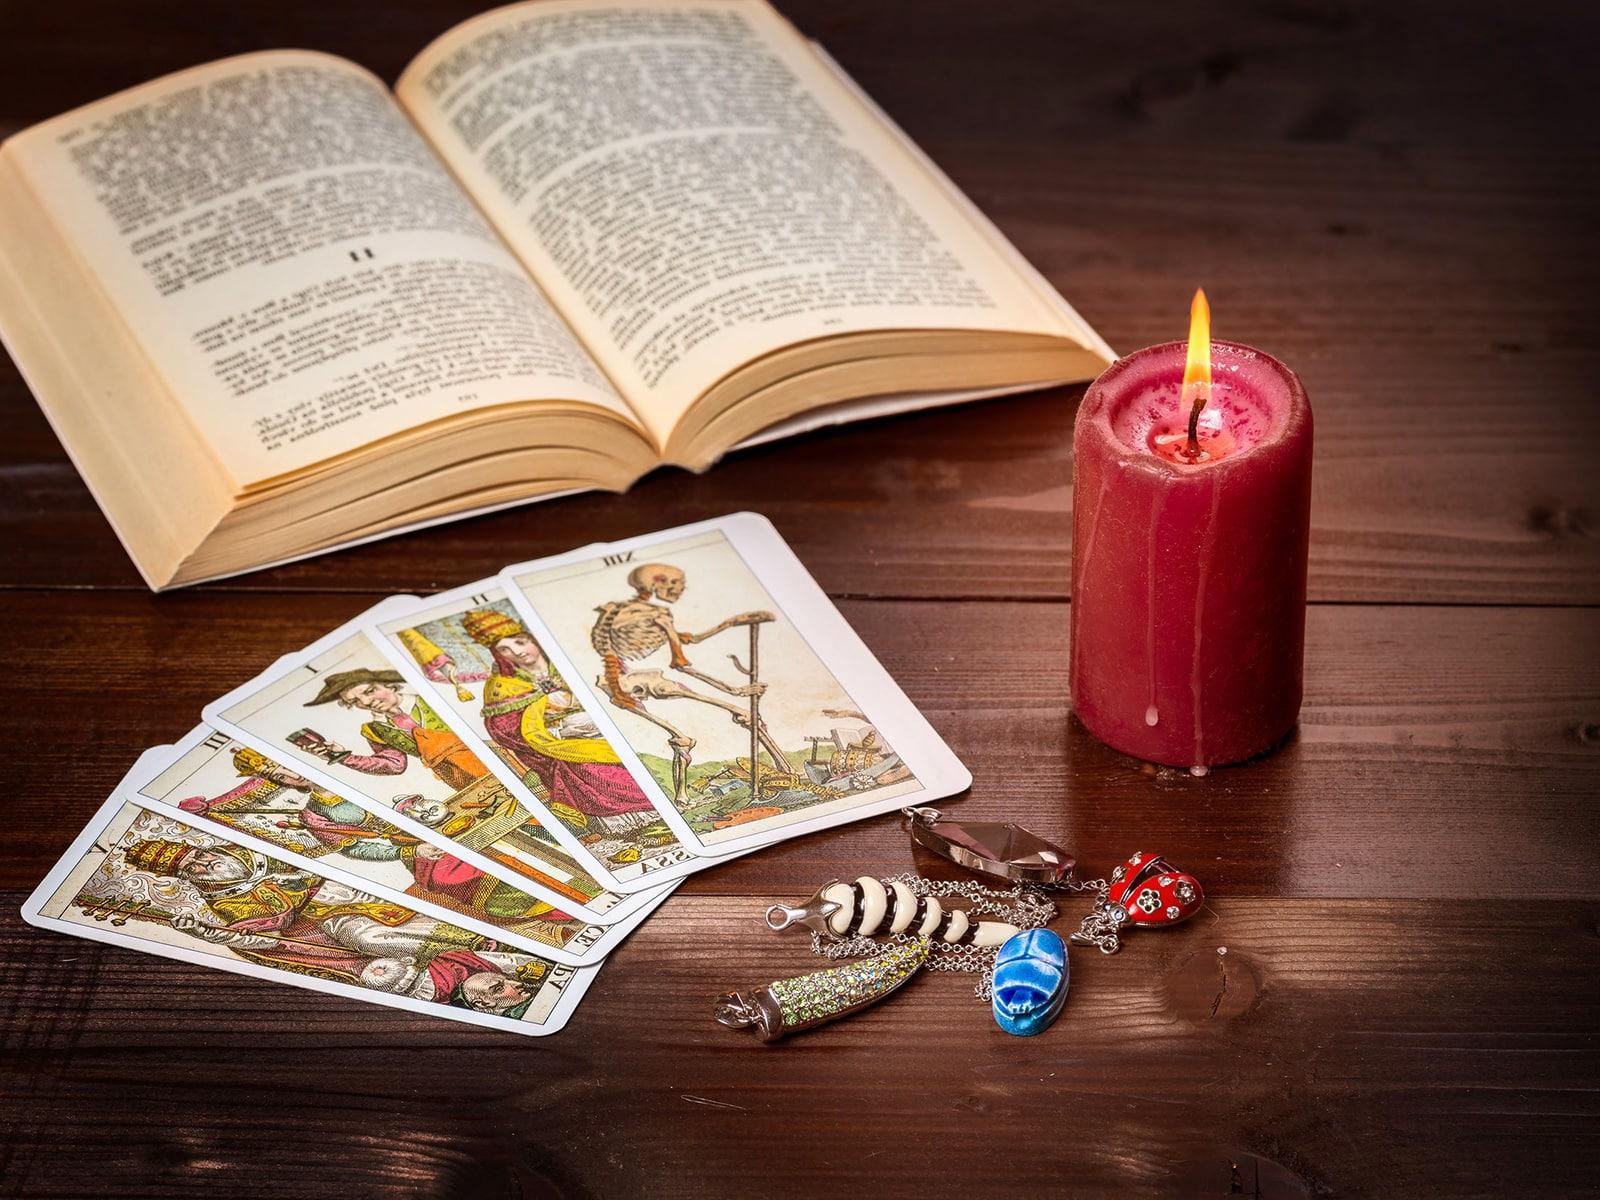 les principaux types de tirage de carte : Tarot, Oracle, Cartomancie- Partie 2